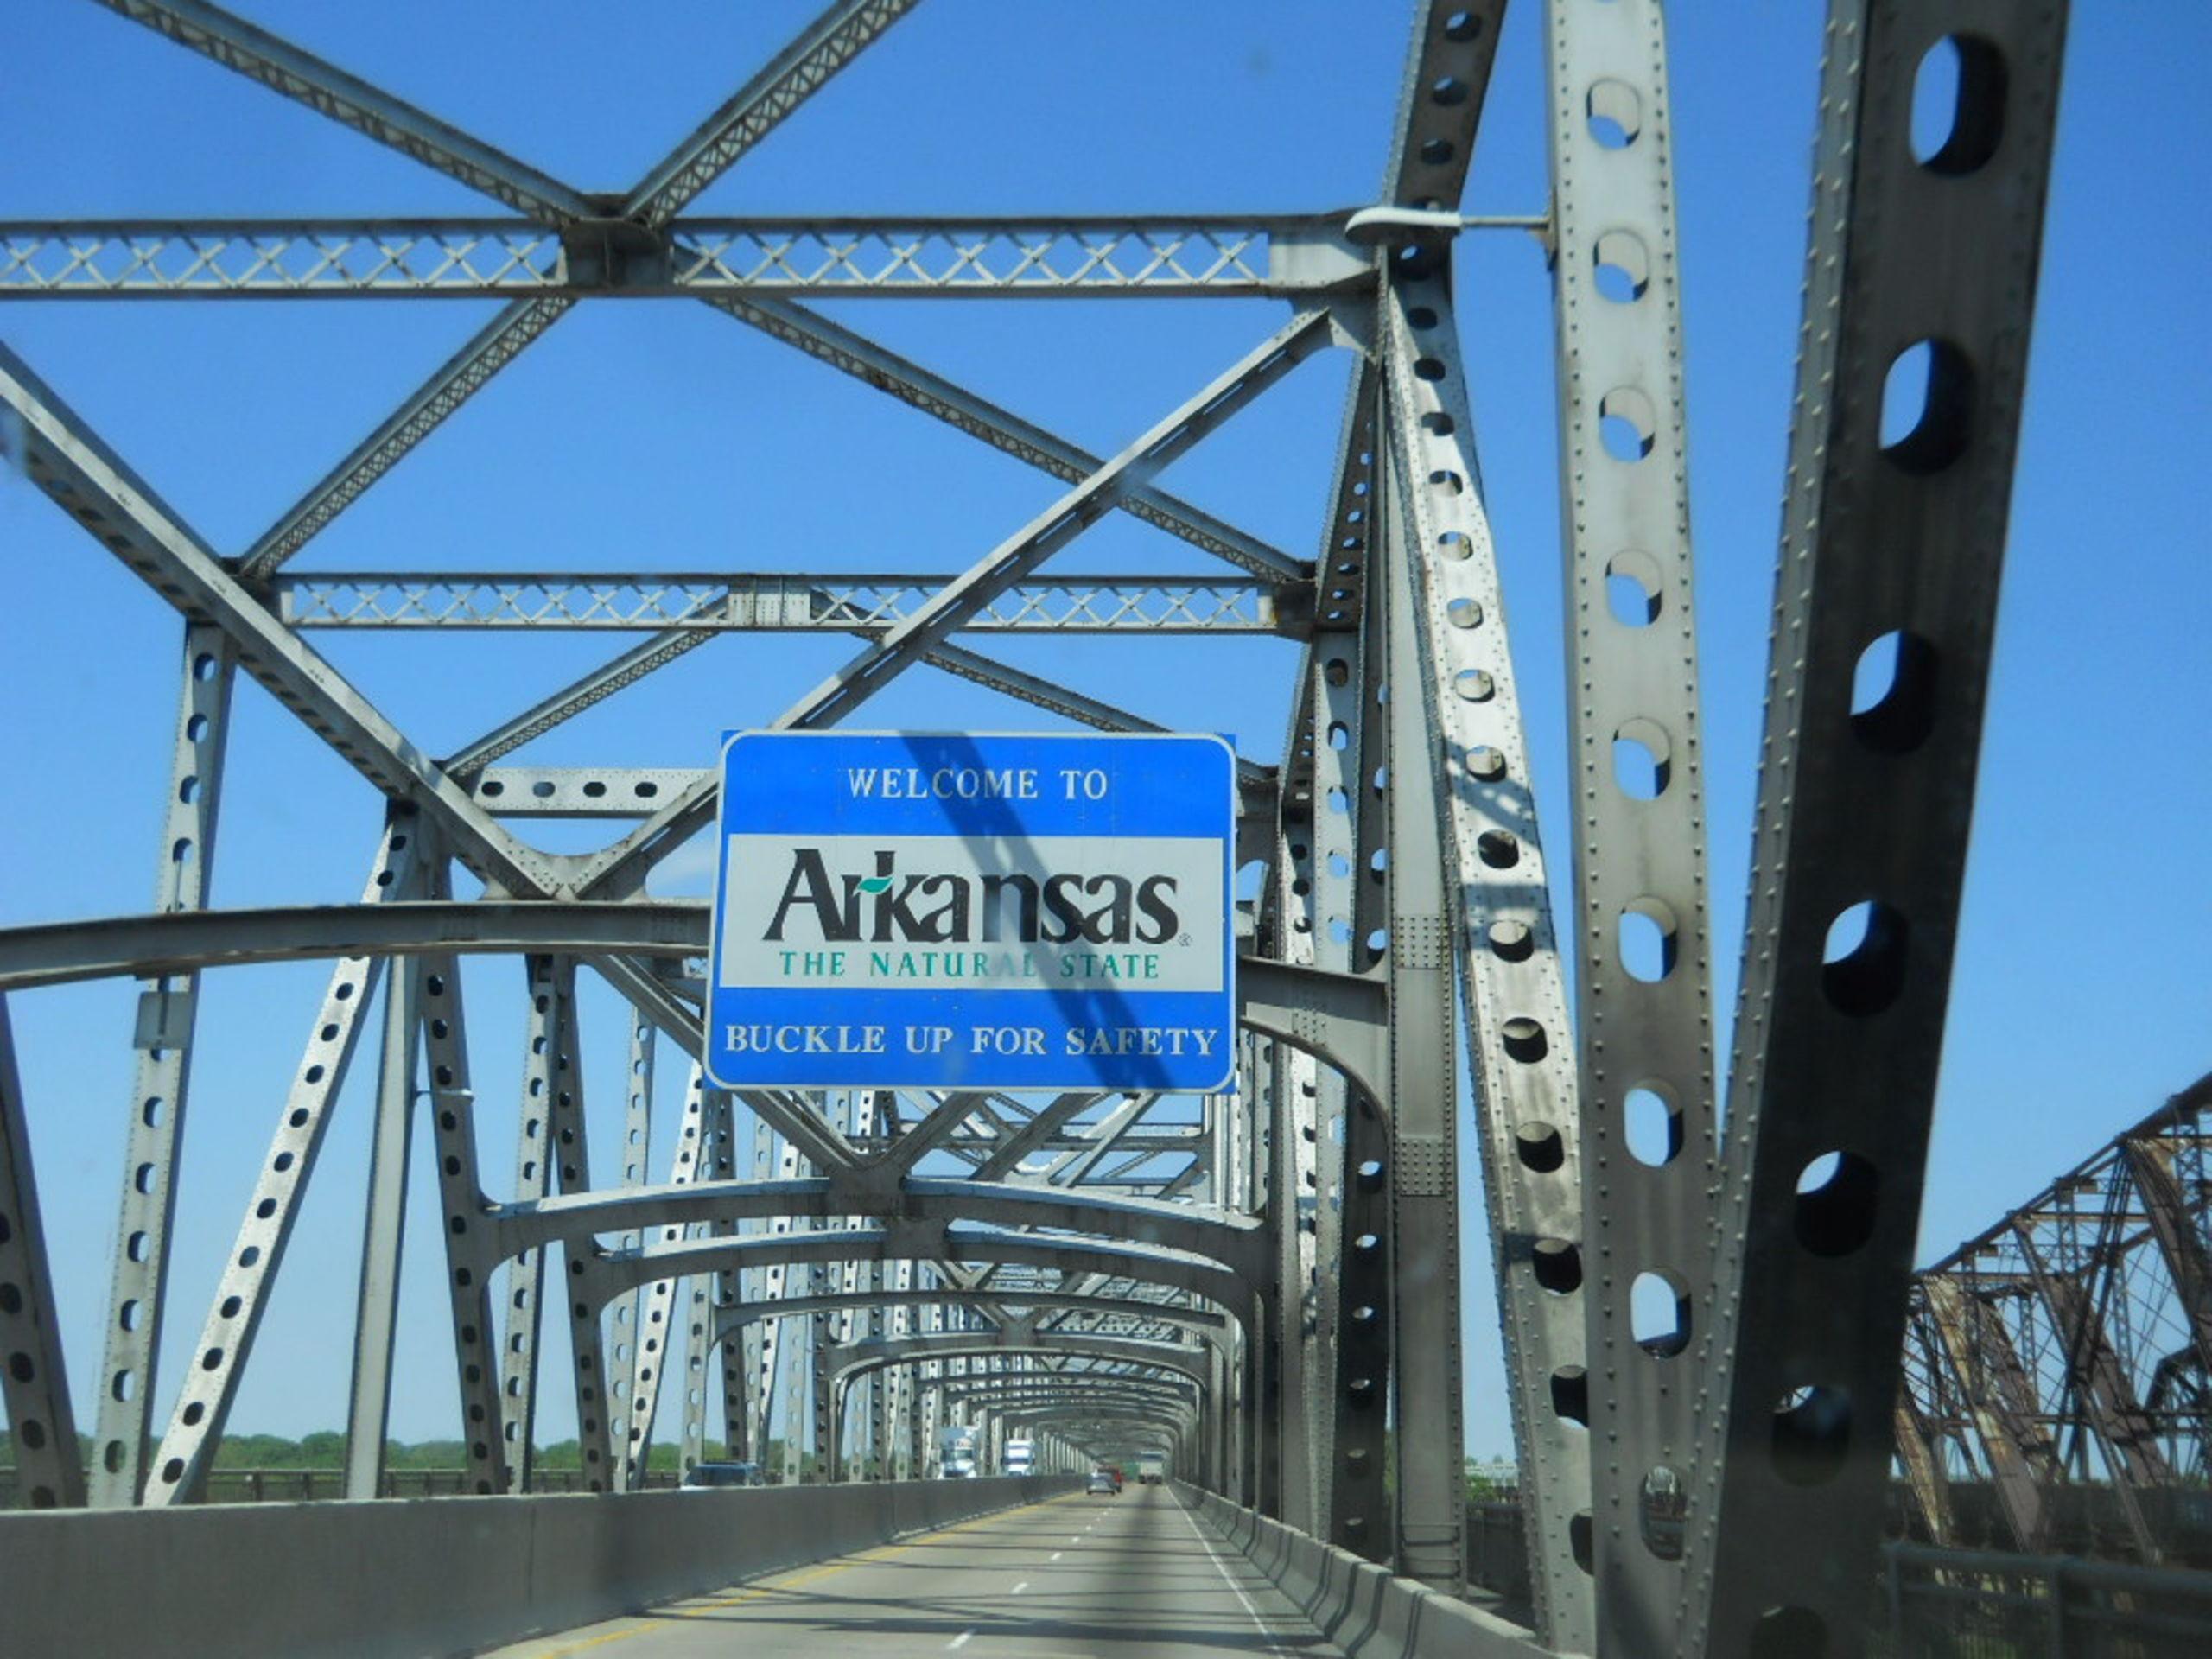 ARKansas Marion Jonesboro Blytheville Real Estate Relocation Military Realtor